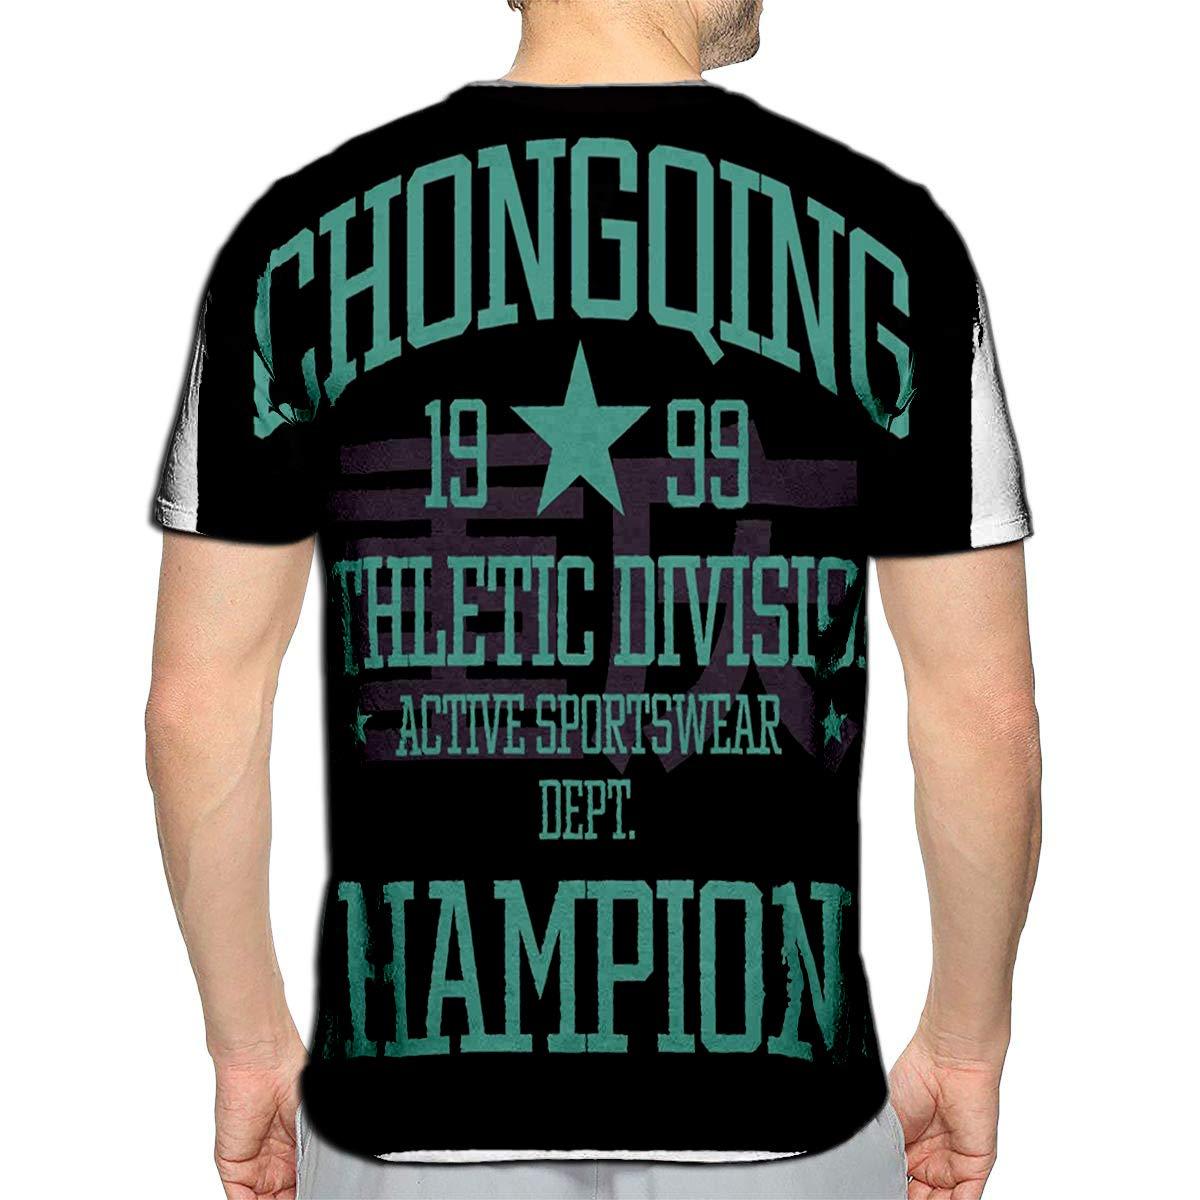 3D Printed T-Shirts Chongqing College Sport Team Style Chong Short Sleeve Tops T